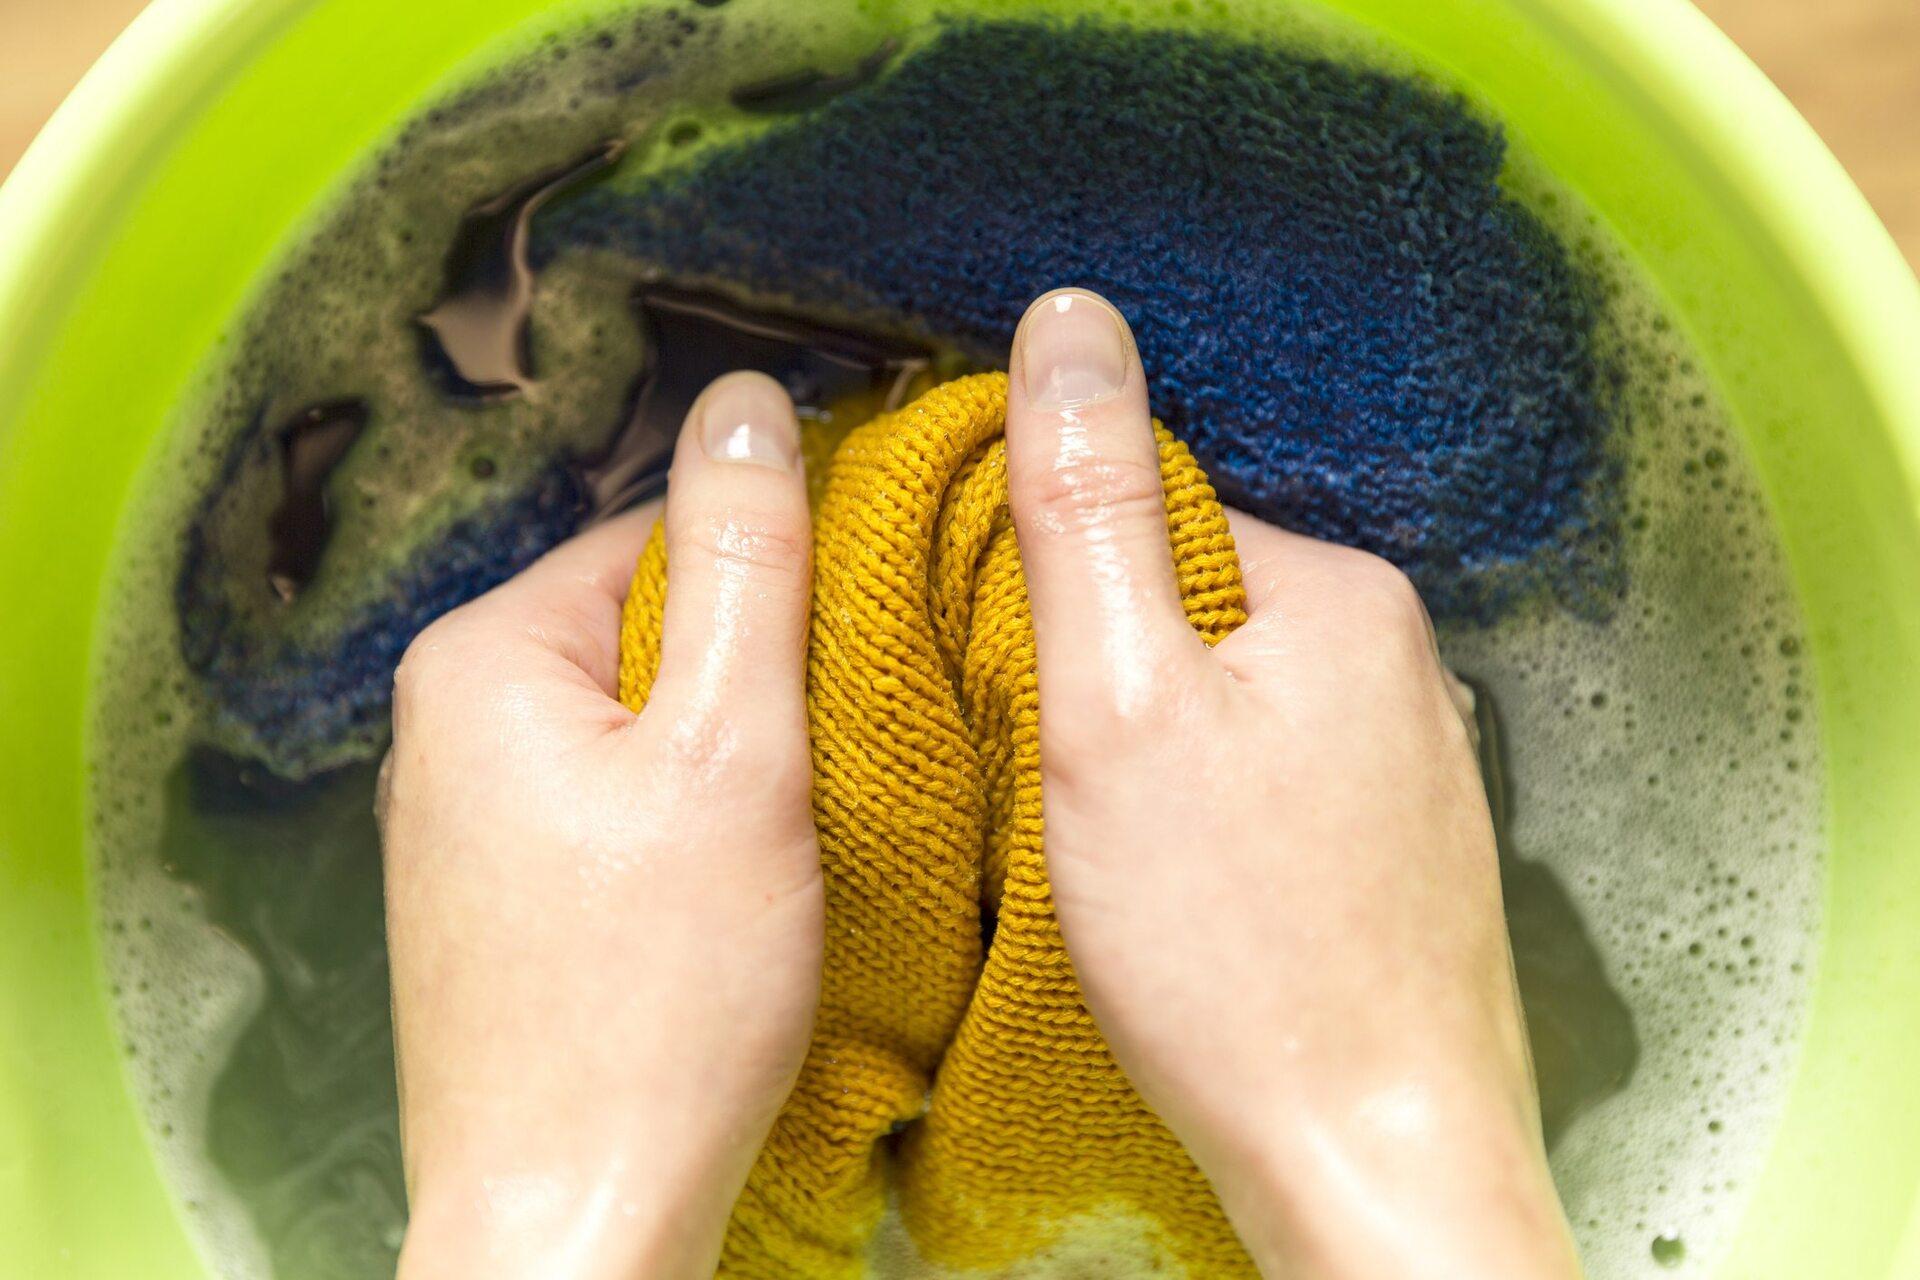 Pessoa lavando roupa